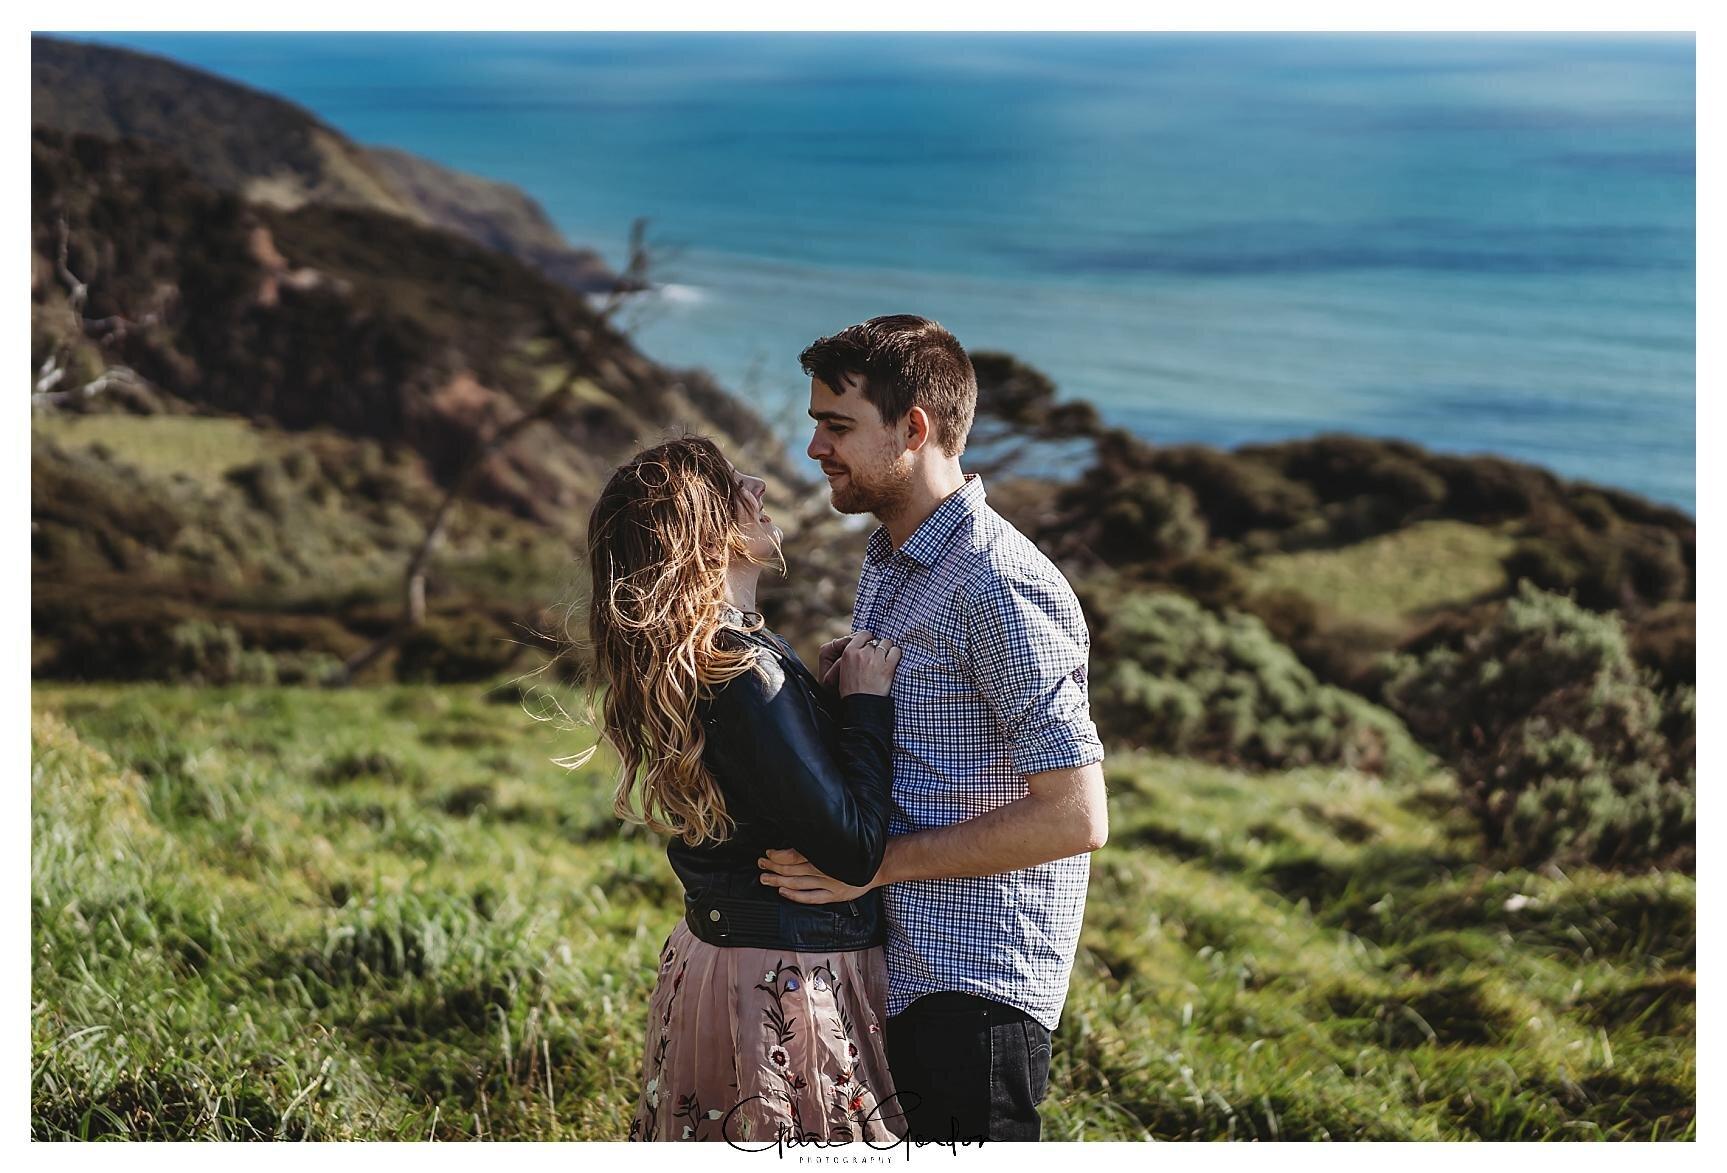 Raglan-beach-NZ-couples-engagement-photos-West-coast-Newzealand (8).jpg